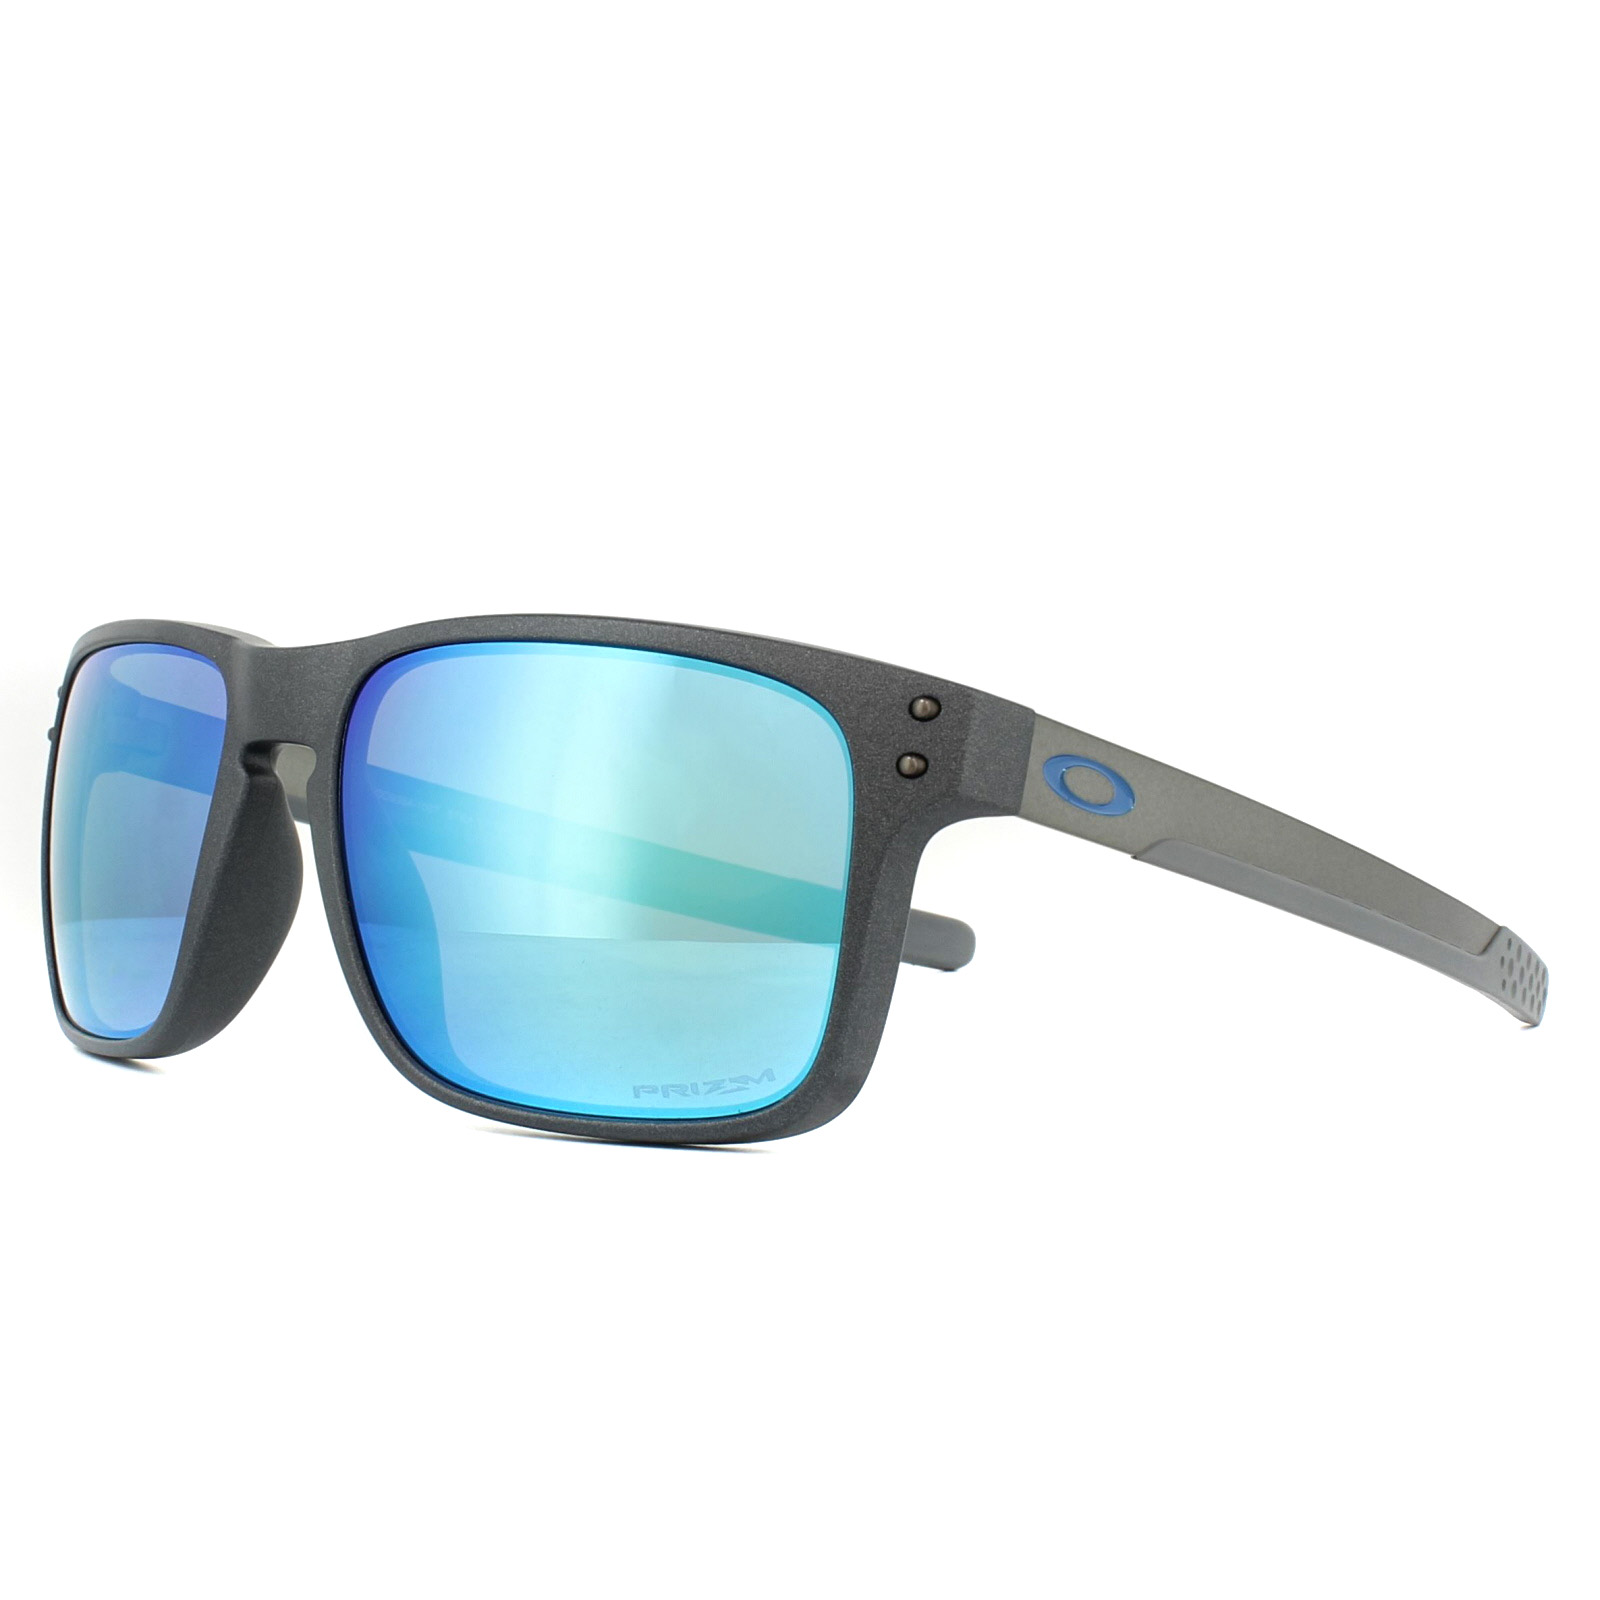 128f8074b Sentinel Oakley Sunglasses Holbrook Mix OO9384-10 Steel Prizm Sapphire  Polarized